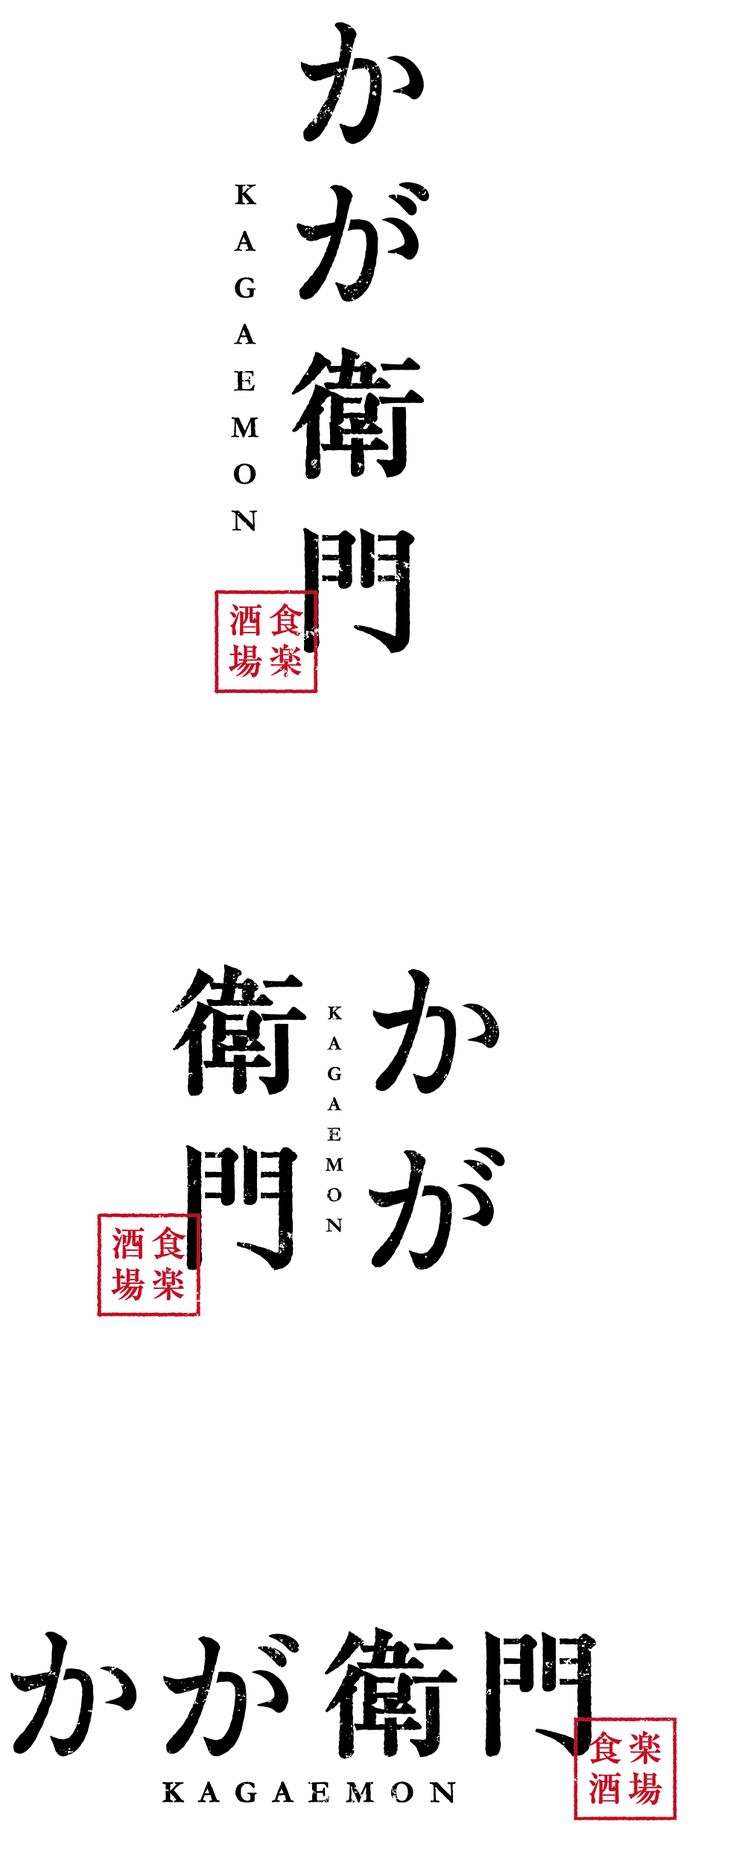 ishikawa kaga / kagaemon